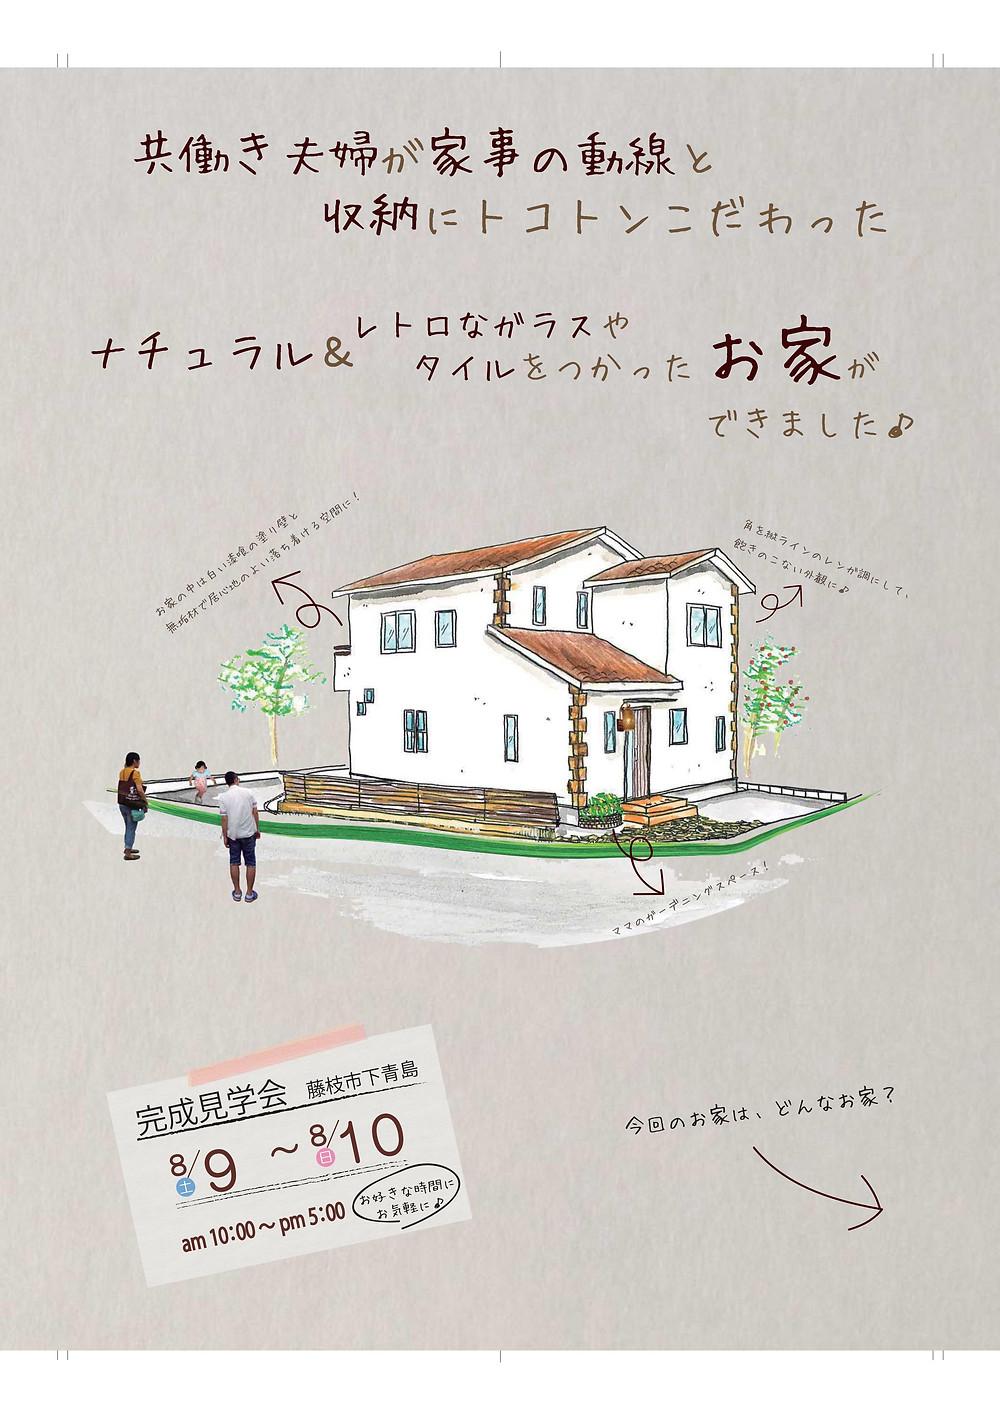 B4たて_表面_01.jpg